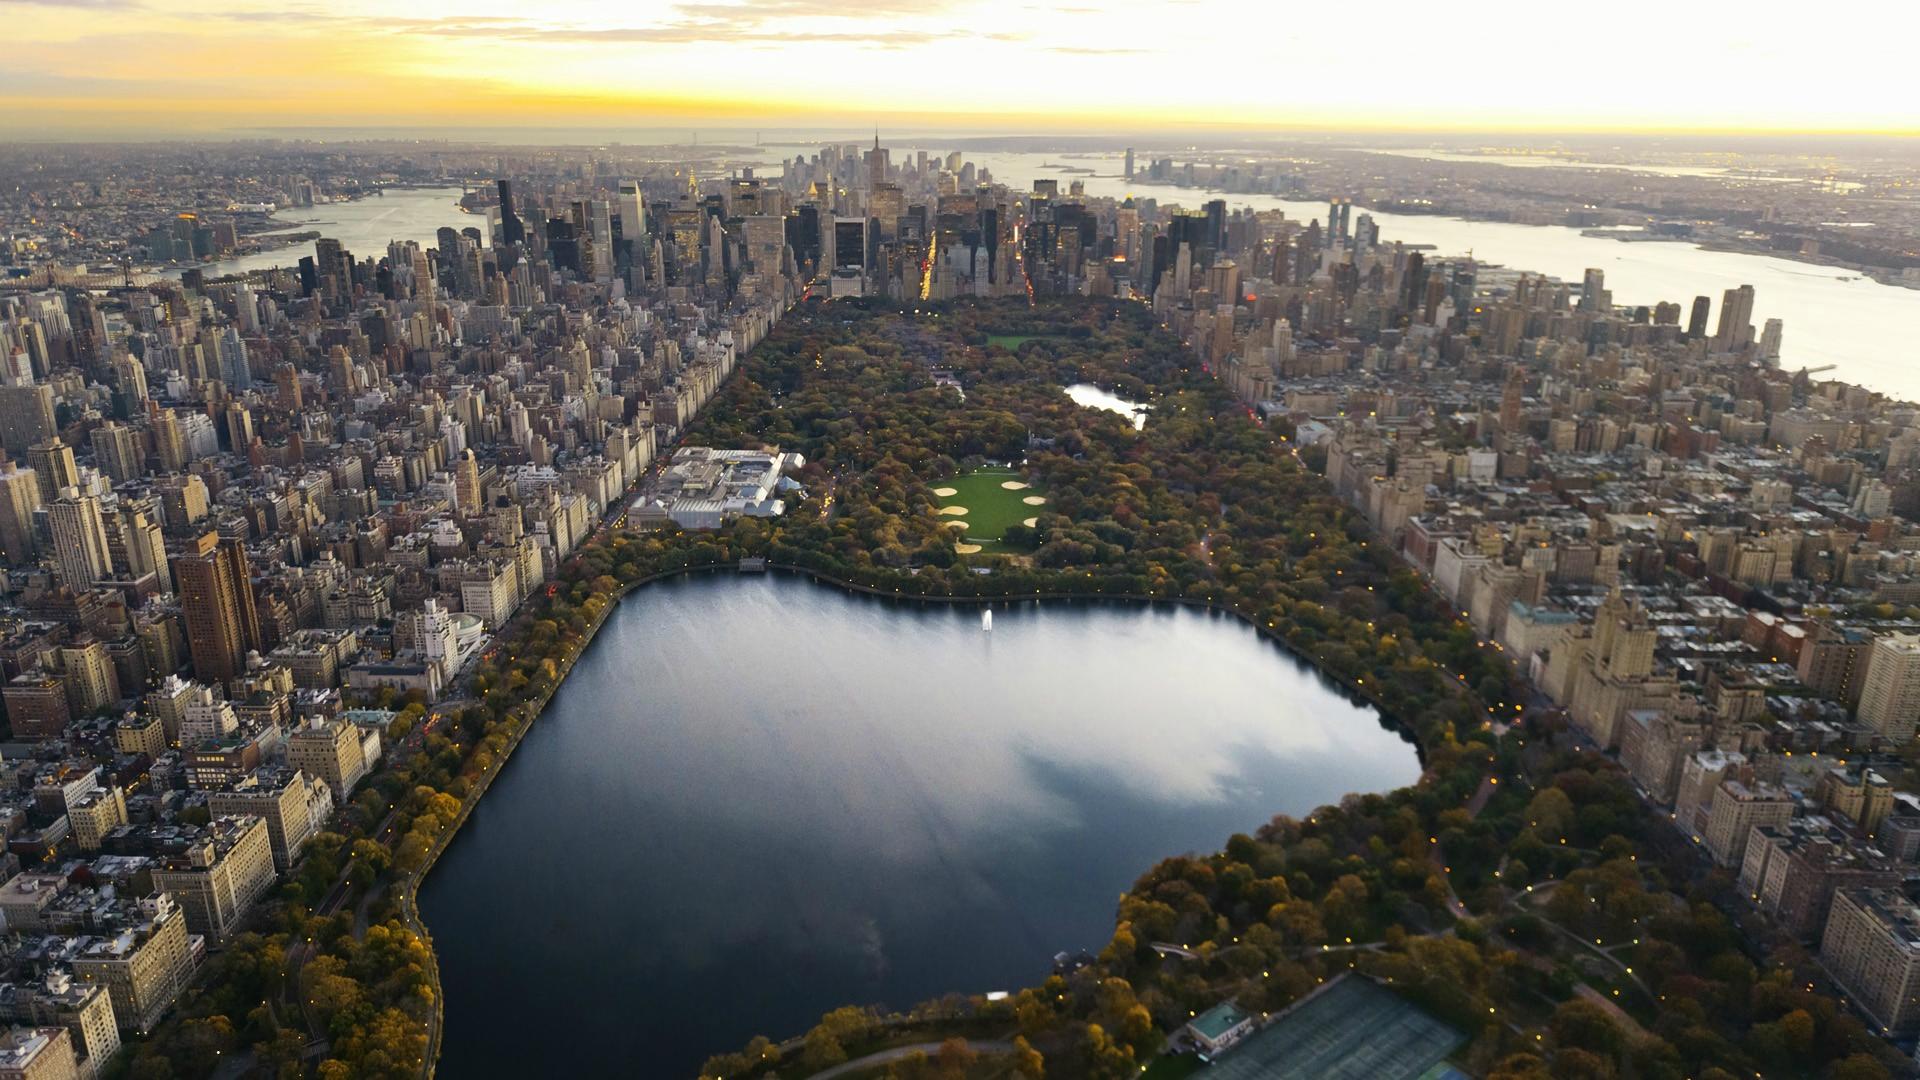 Aerial View Of New York City Hd Wallpaper Hintergrund